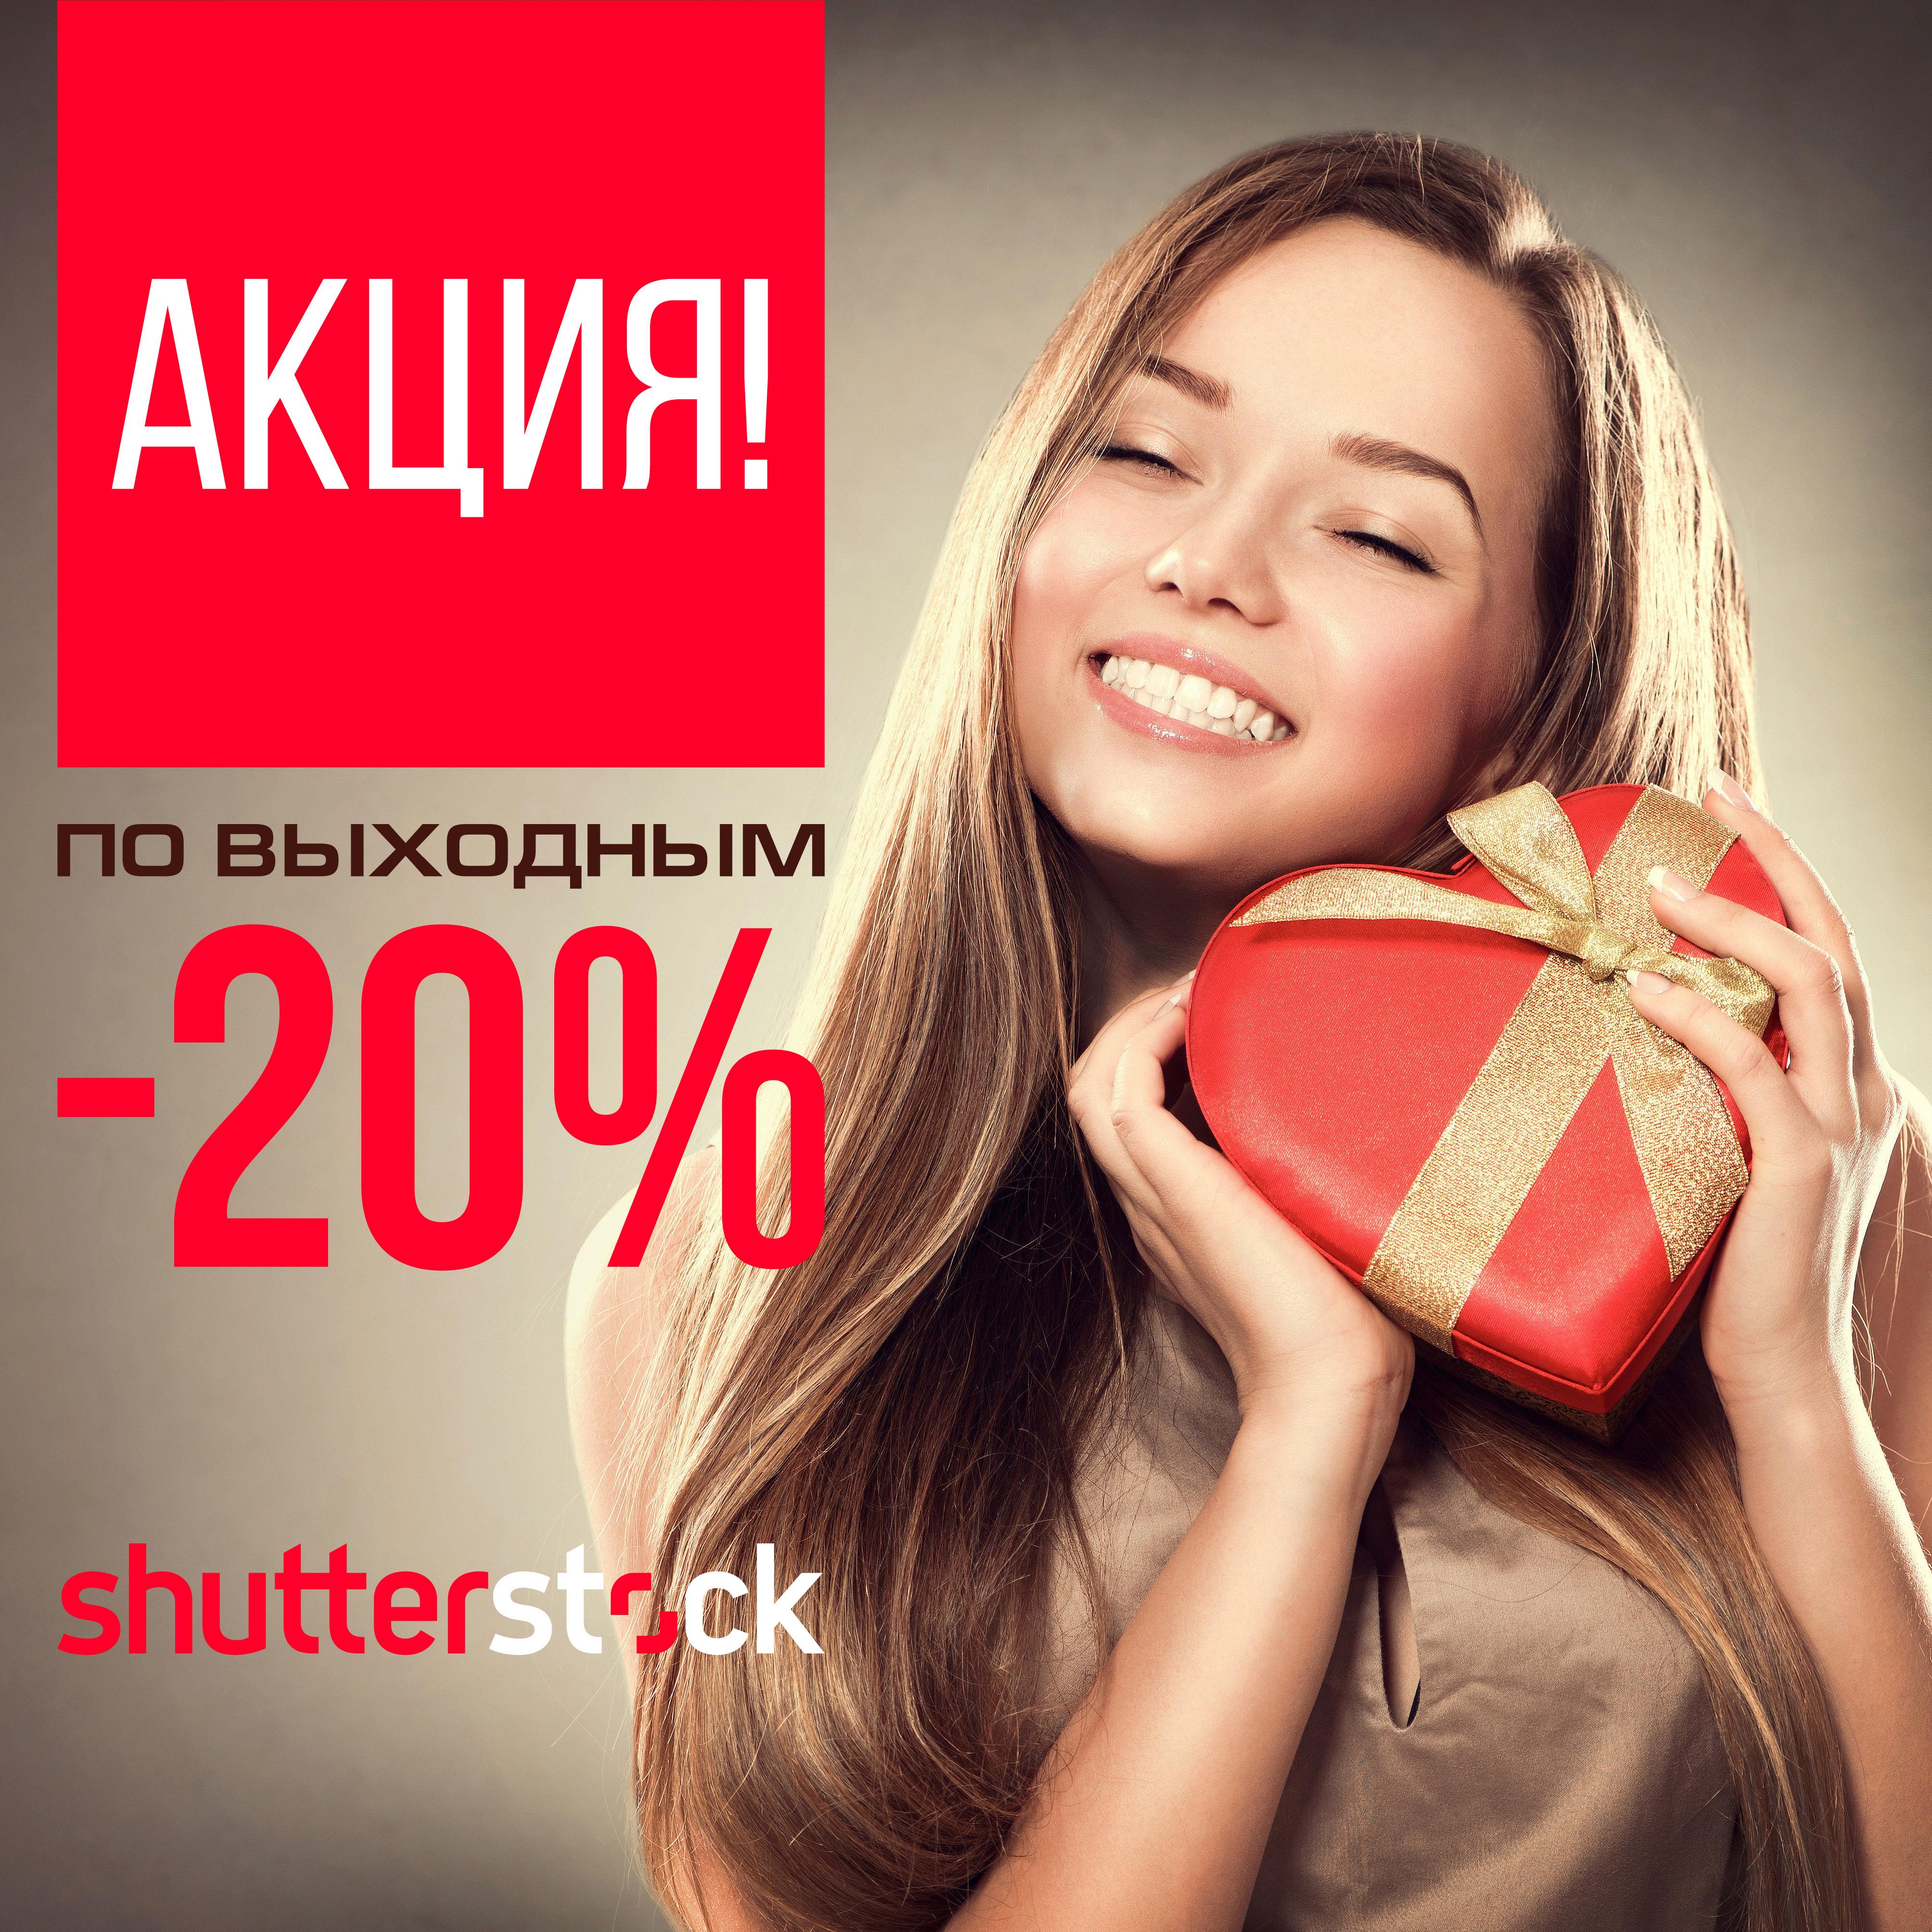 �����! ������ 20% �� �������� �� ����� ����������� � ��������� Shutterstock!